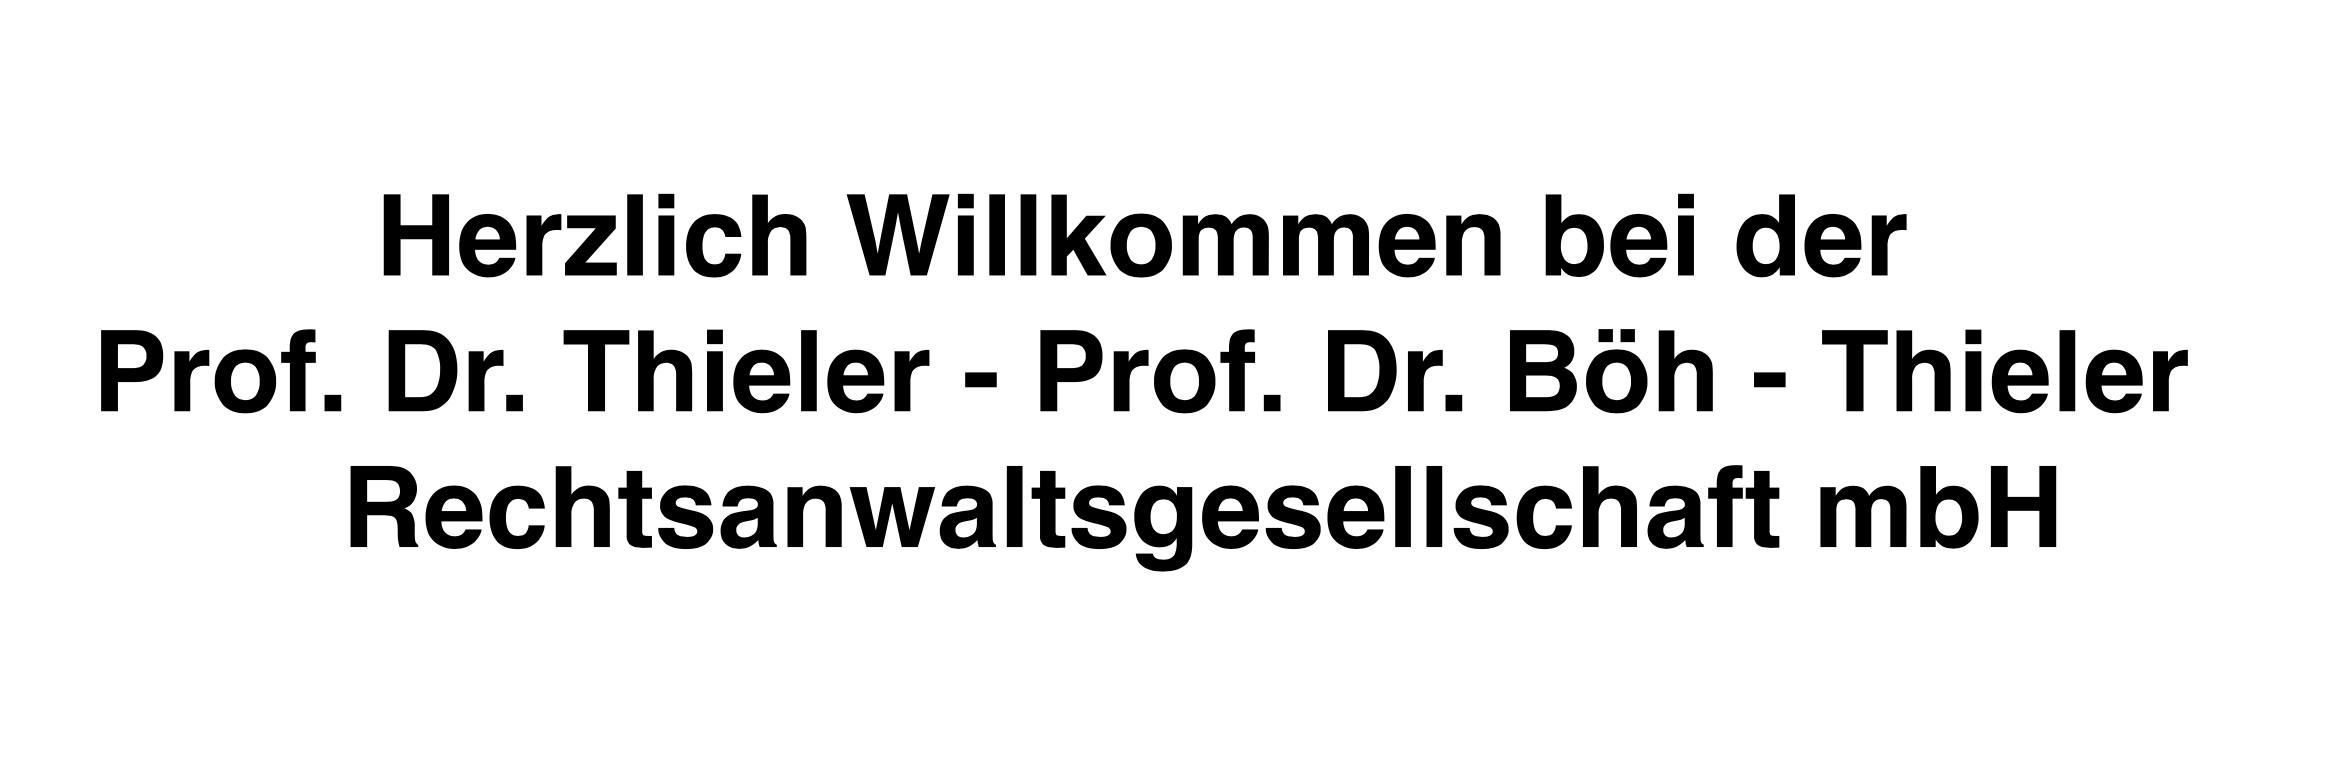 Herzlich Willkommen bei der Prof. Dr. Thieler – Prof. Dr. Boeh – Thieler  Rechtsanwaltsgesellschaft mbH